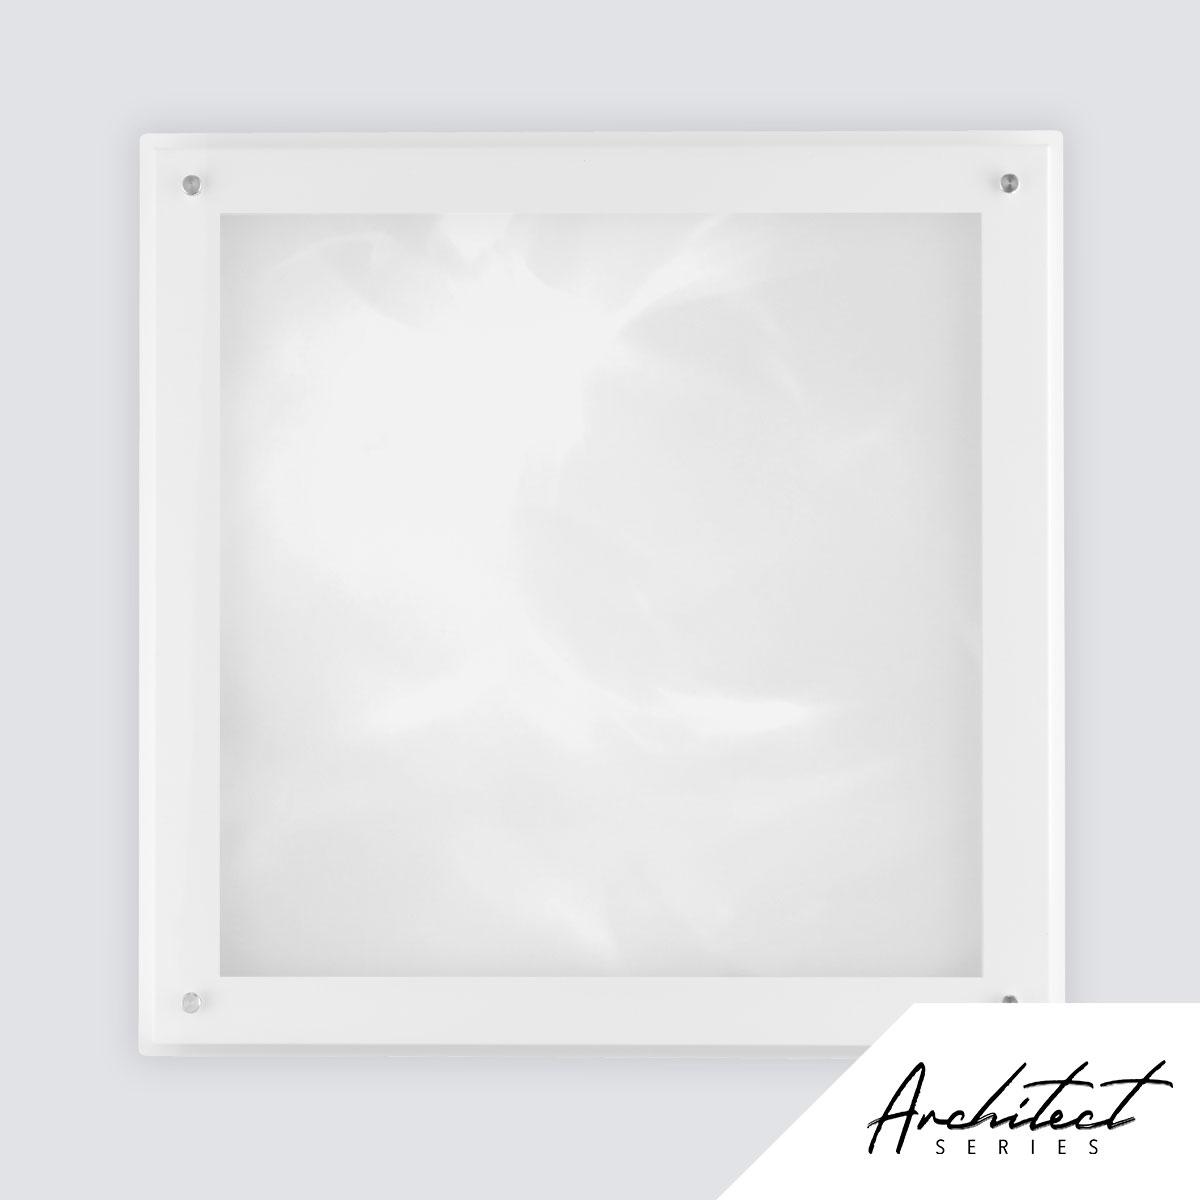 Justfrost Stvorcovy Difuzor Pre Svetlovod